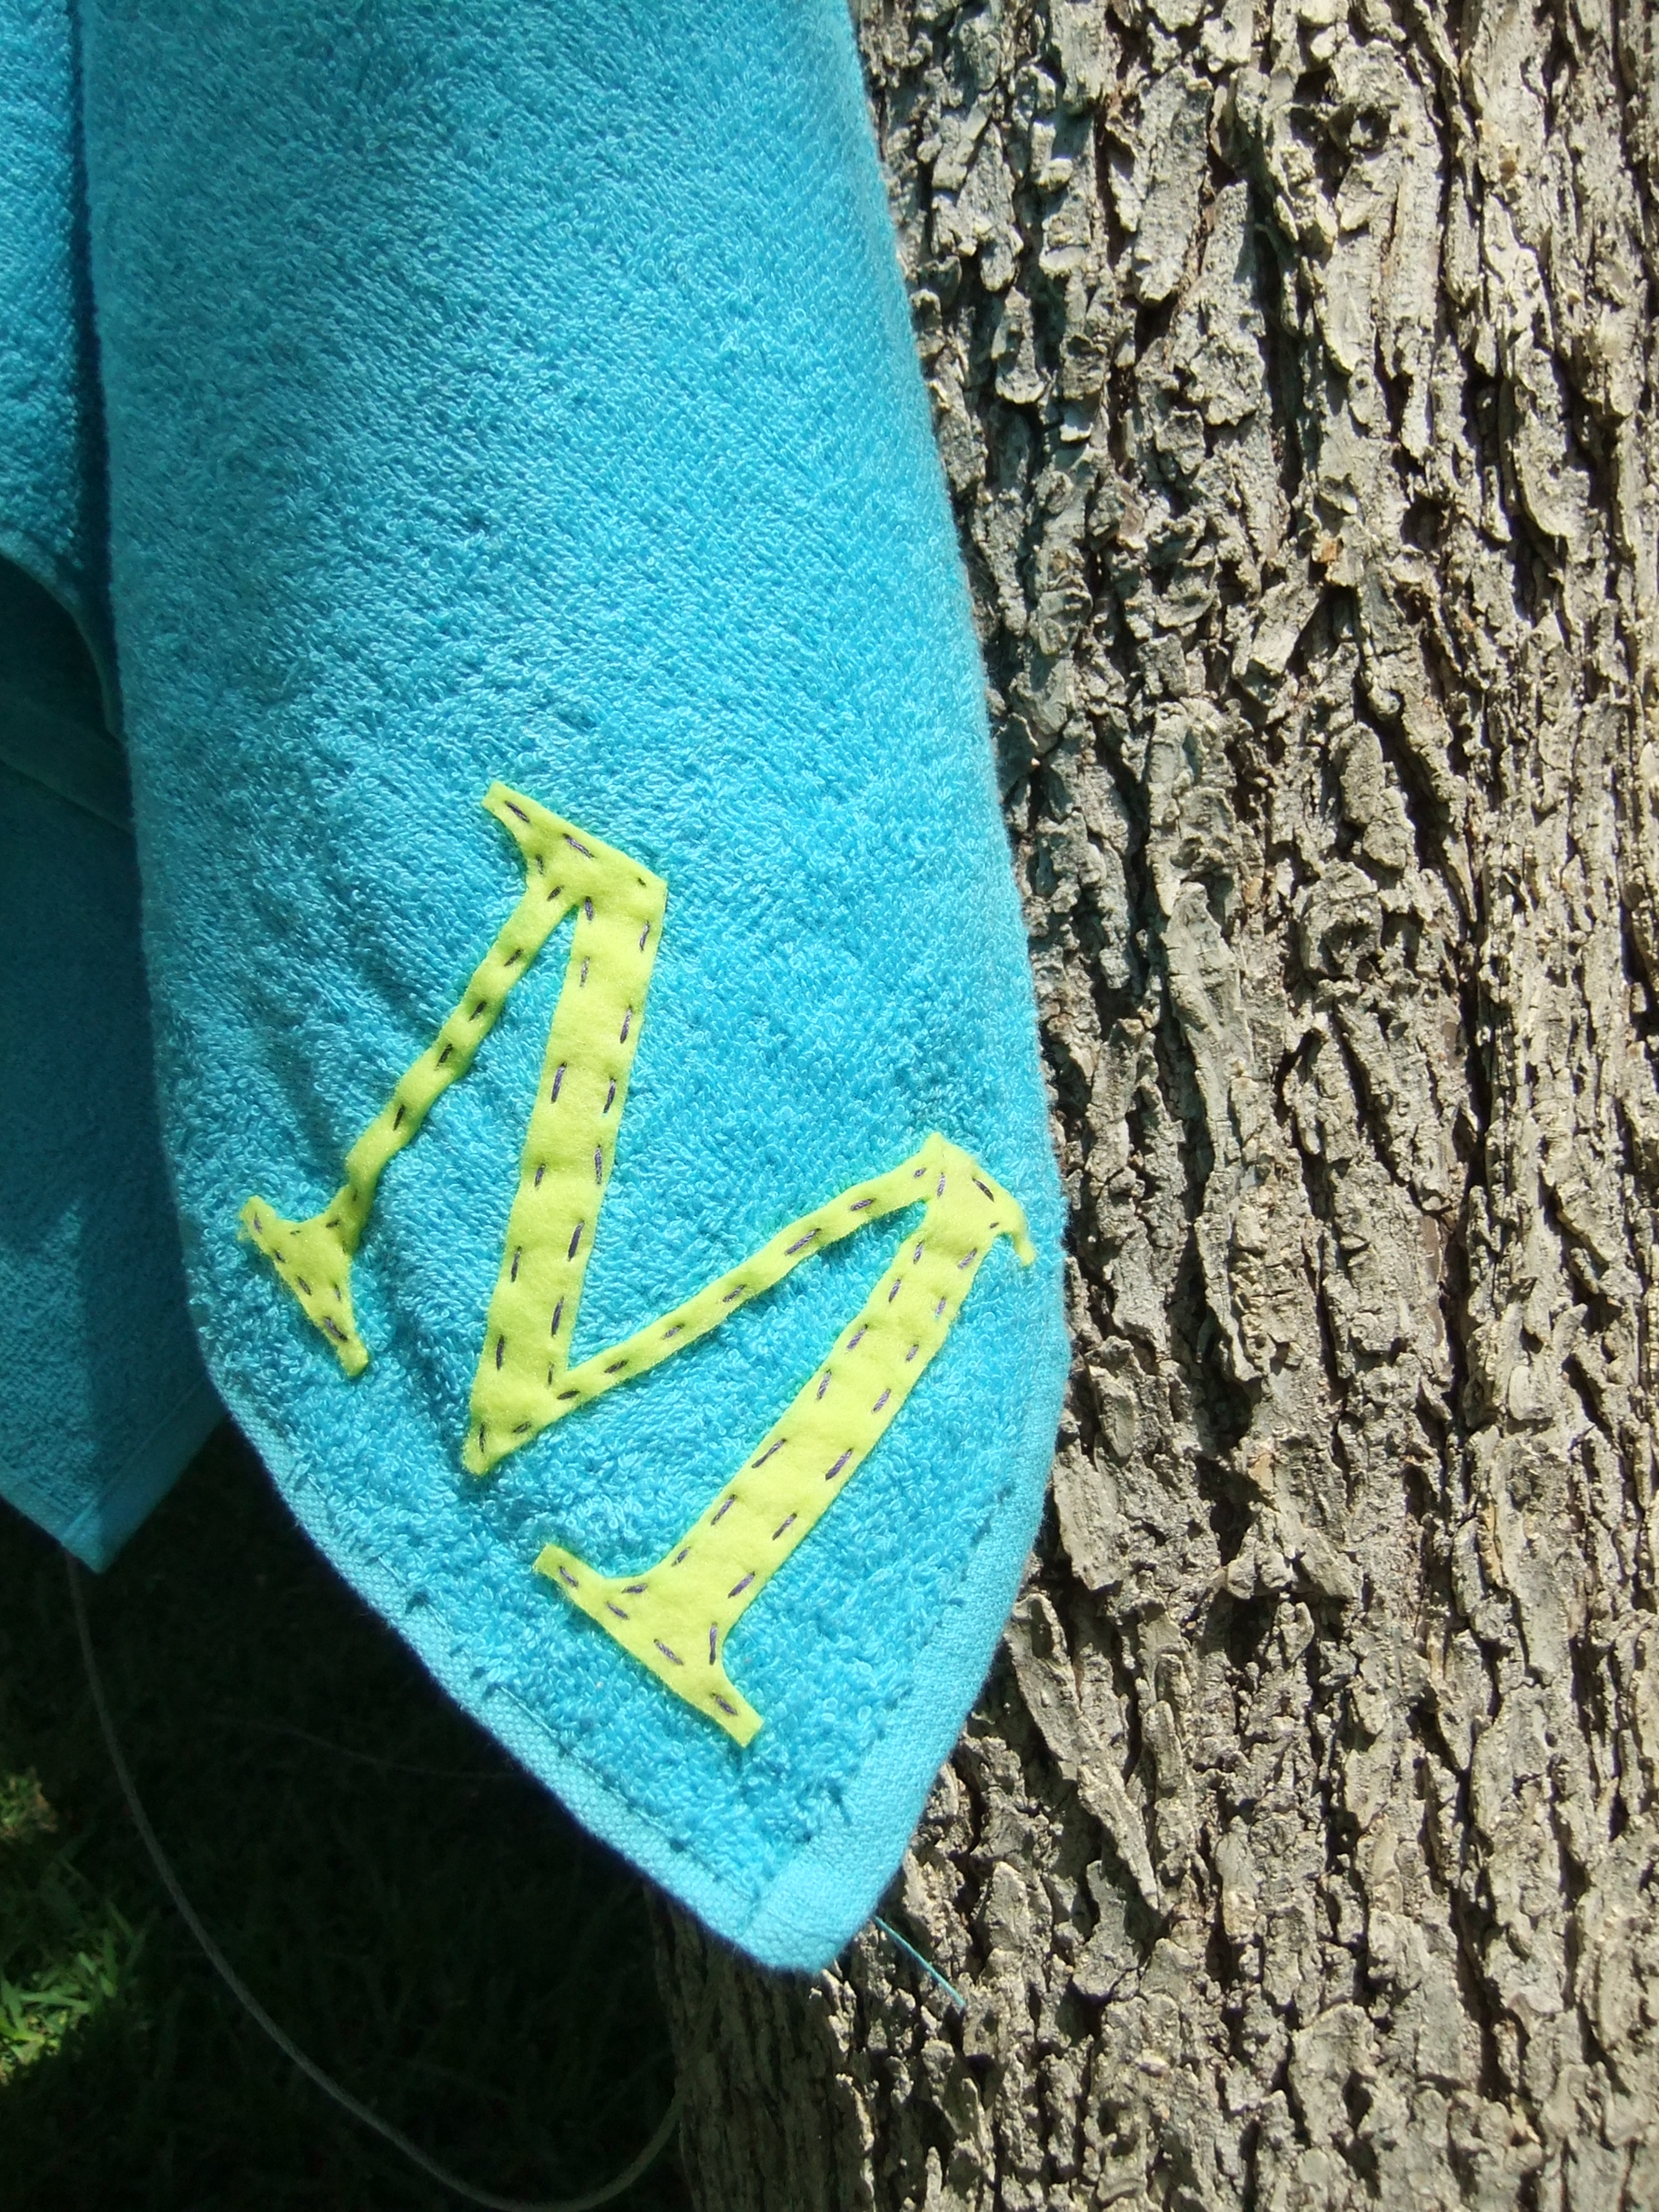 Laser Cut Felt Applique Monogramed Towel